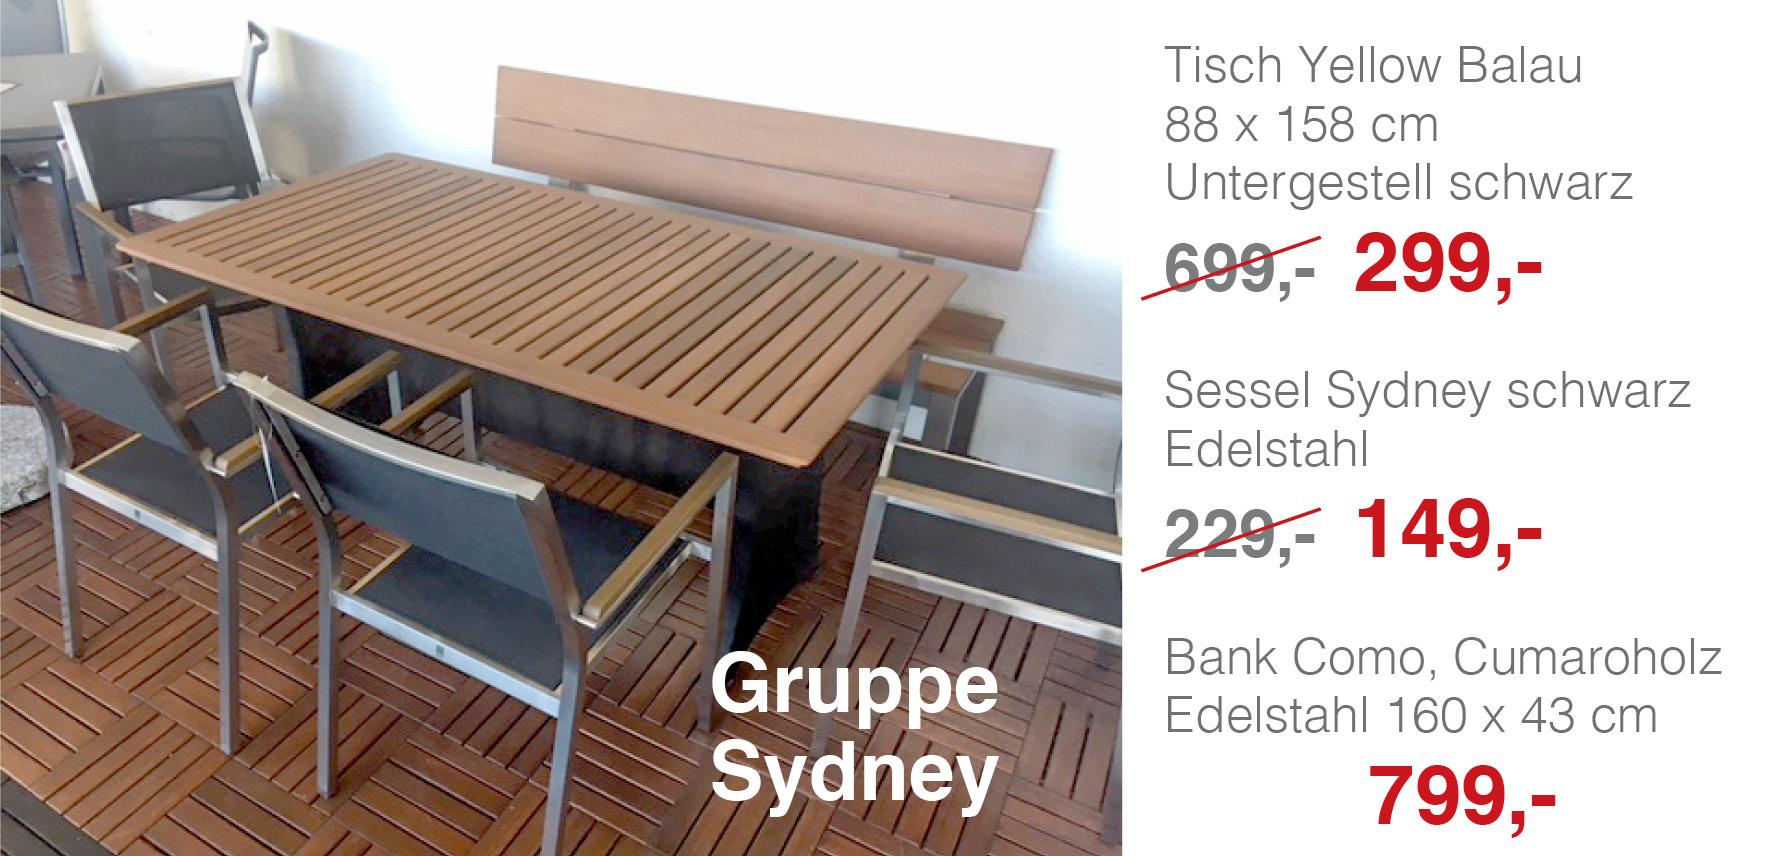 Gruppe Sydney - Bank Como, Cumaroholz, Edelstahl - MBM Gartenmöbel ...